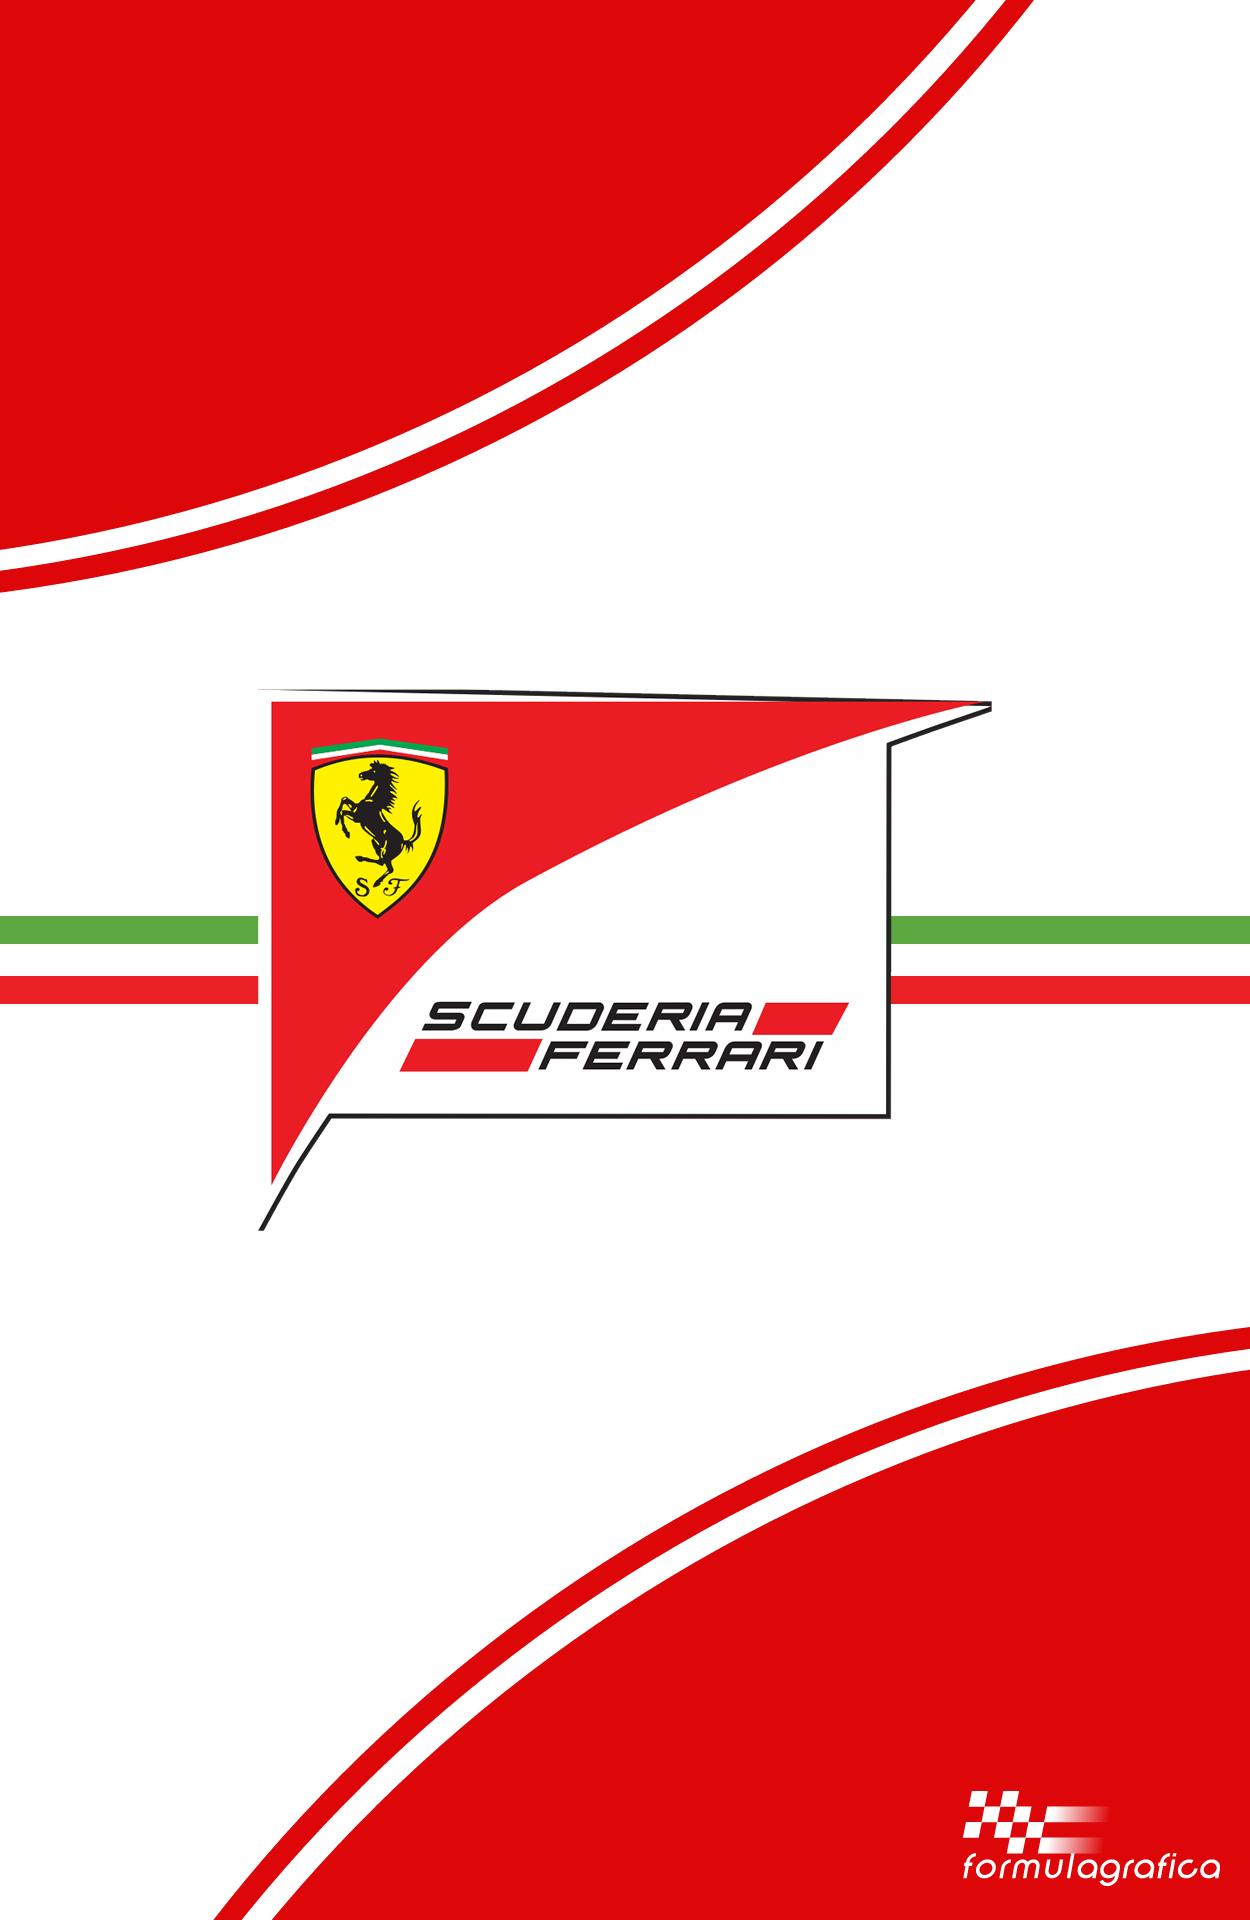 2017 Iphone Wallpaper Scuderia Ferrari Wallpapers Iphone 3008780 Hd Wallpaper Backgrounds Download